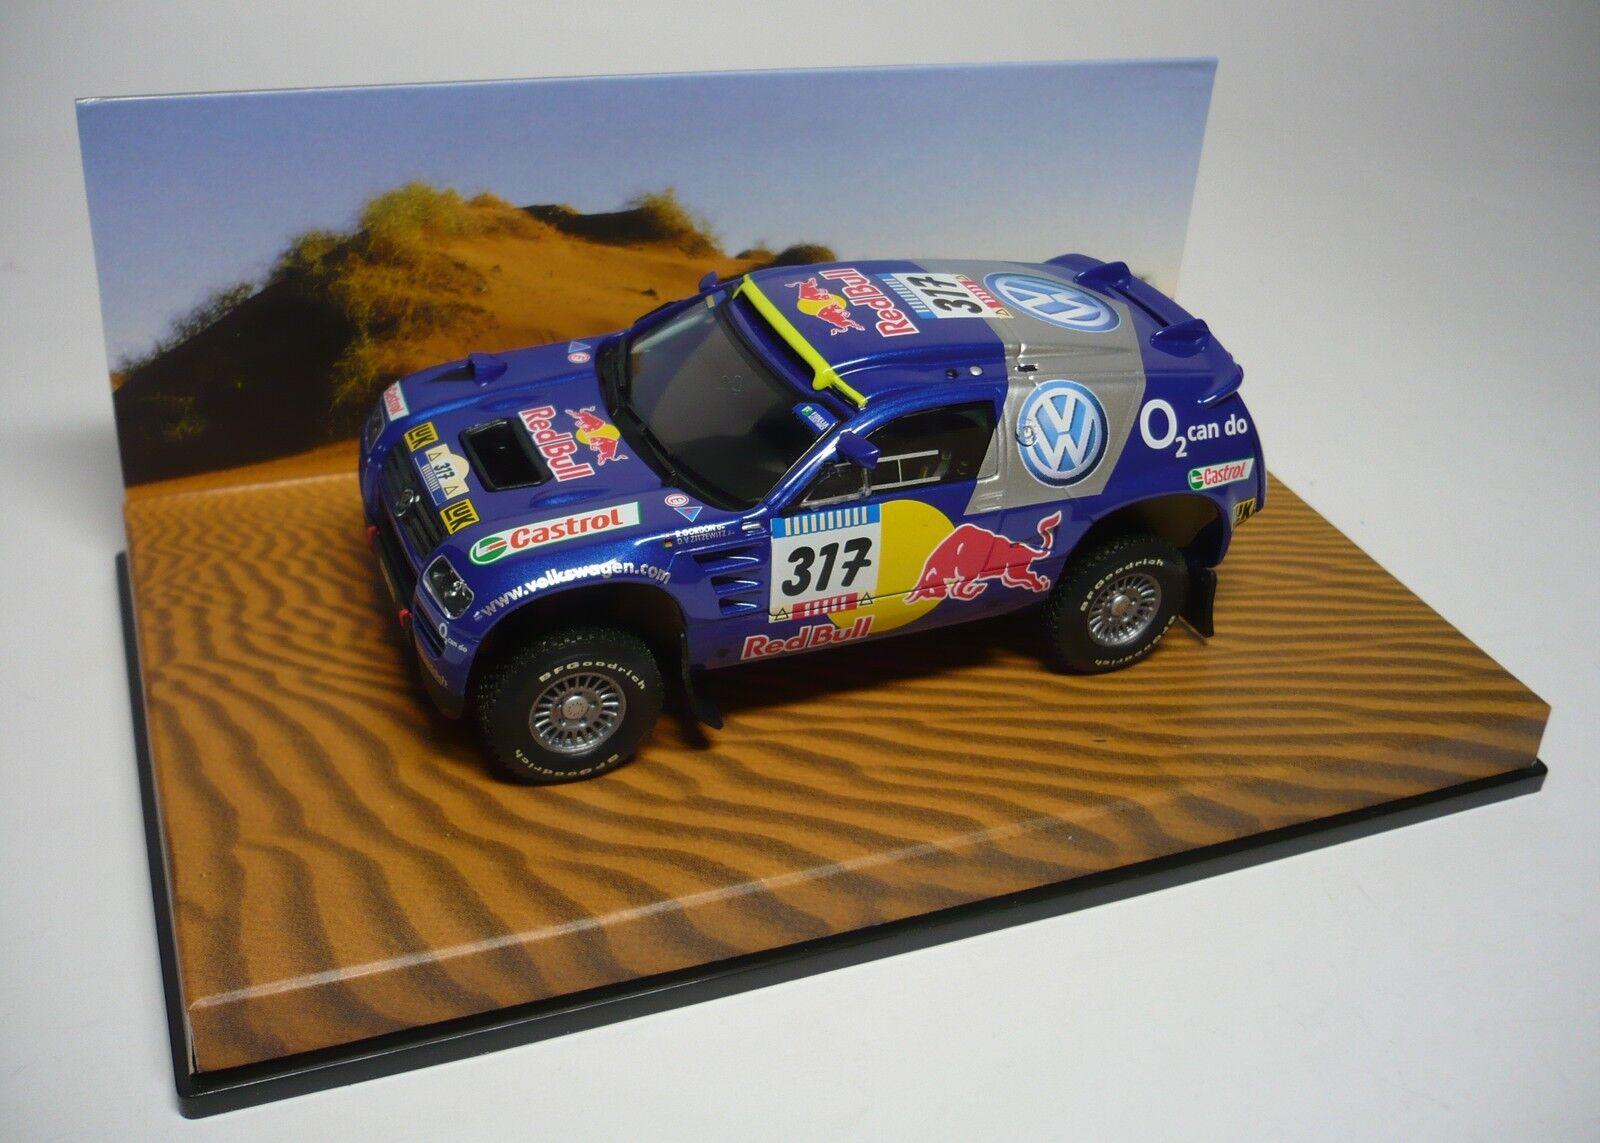 1 VW RACE TOUAREG  317 PARIS DAKAR 2005 1 43 MINICHAMPS